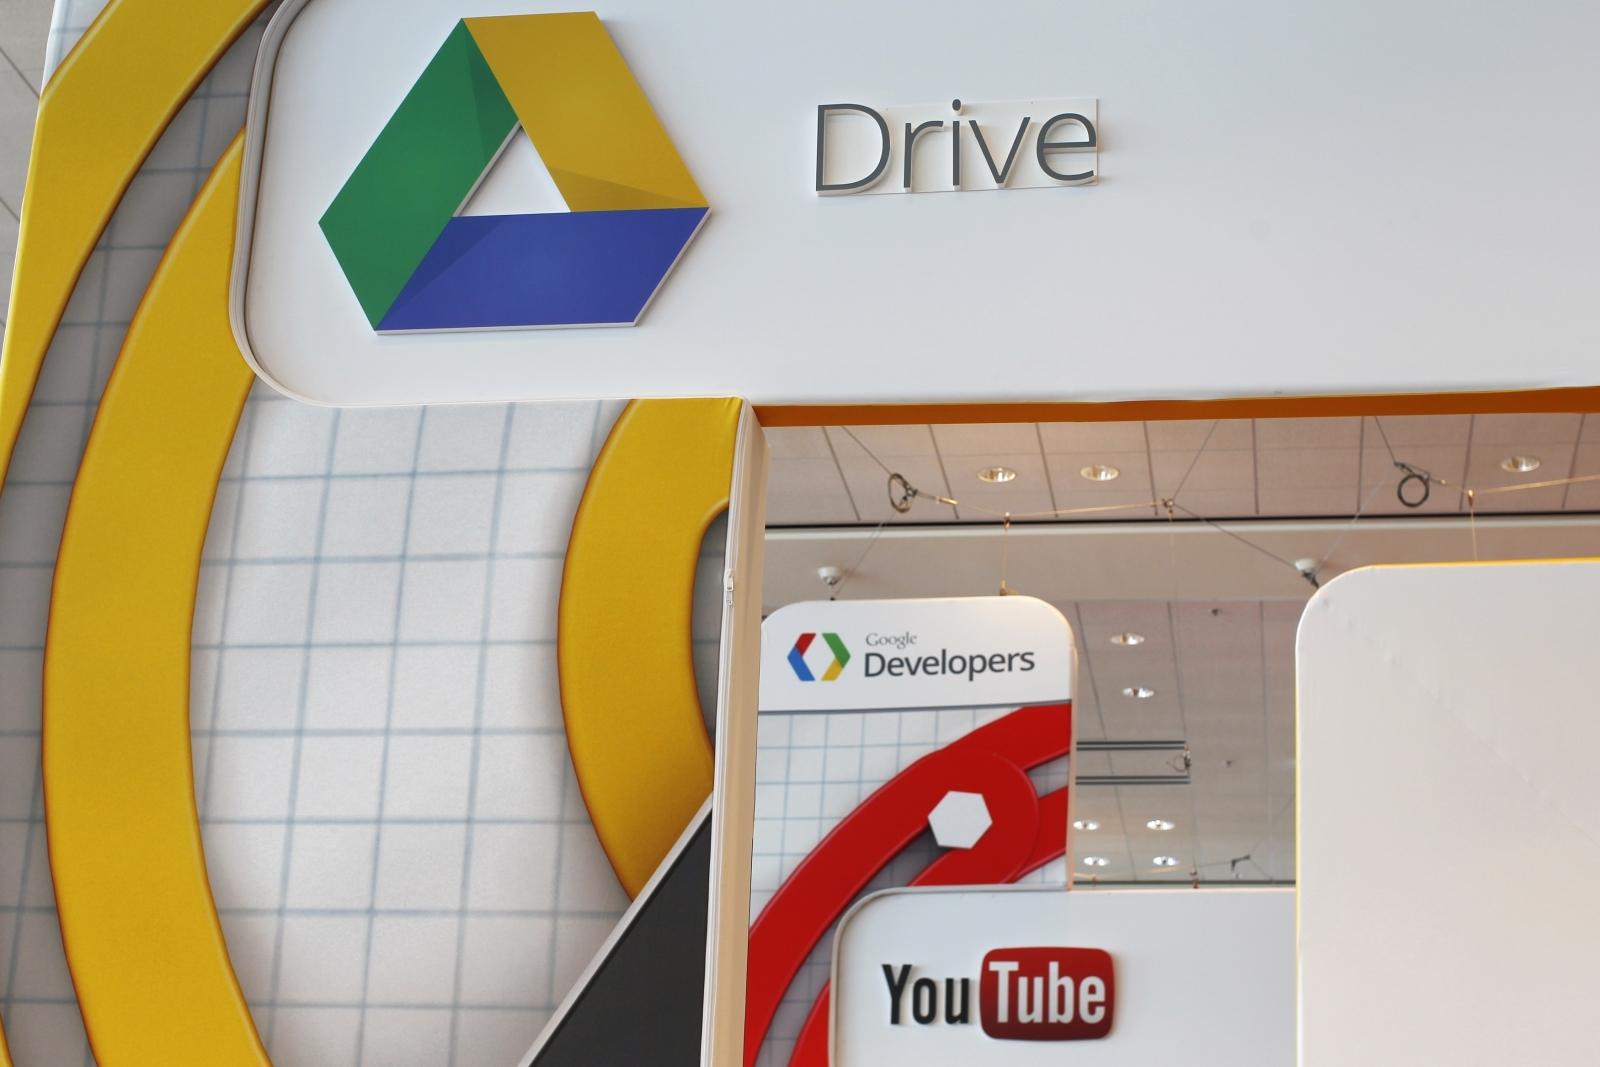 Google Drive transition